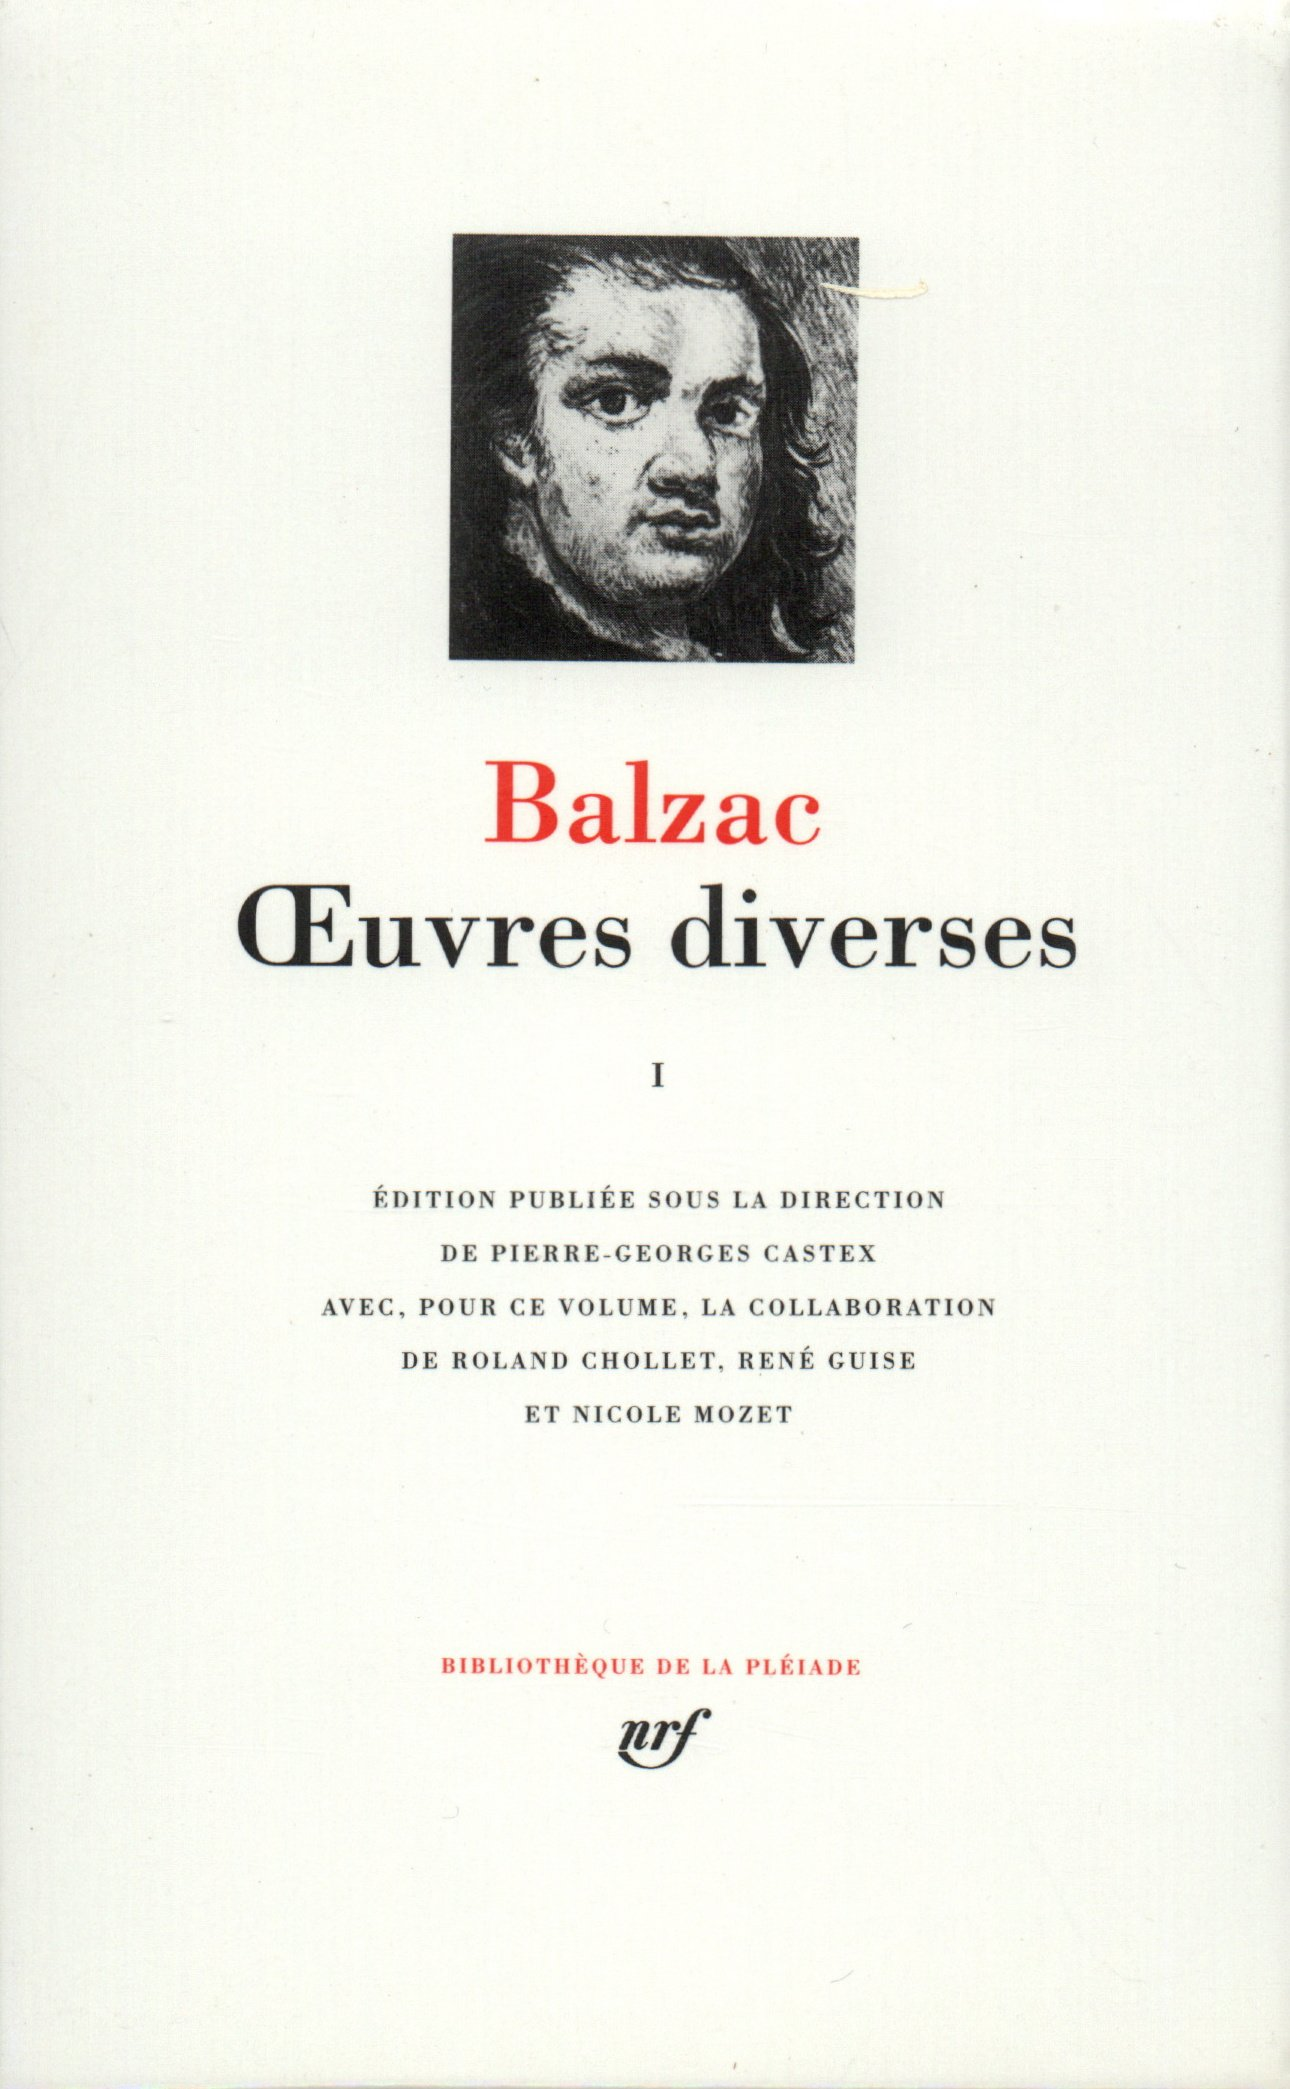 Balzac : Oeuvres diverses, tome 1 (Bibliotheque de la Pleiade) (French Edition) PDF Text fb2 book